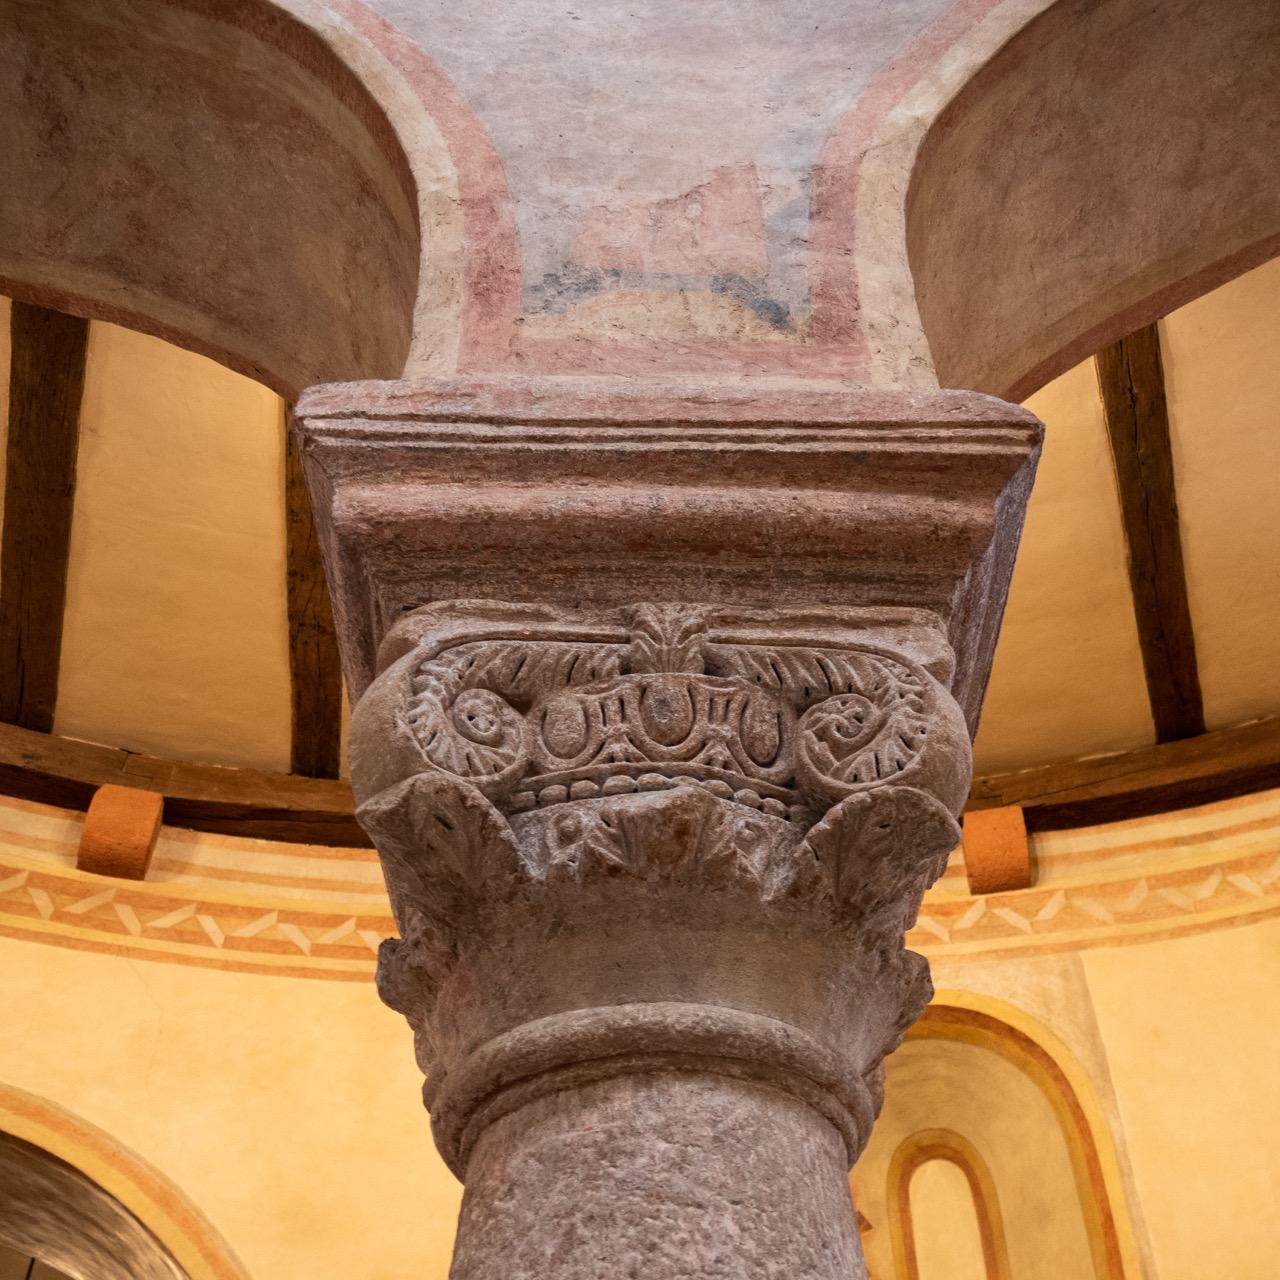 "<a href=""/glossary#Säulenordnung"" target=""_blank"">Kompositkapitell</a> aus dem karolingischen Gründungsbau (822)"